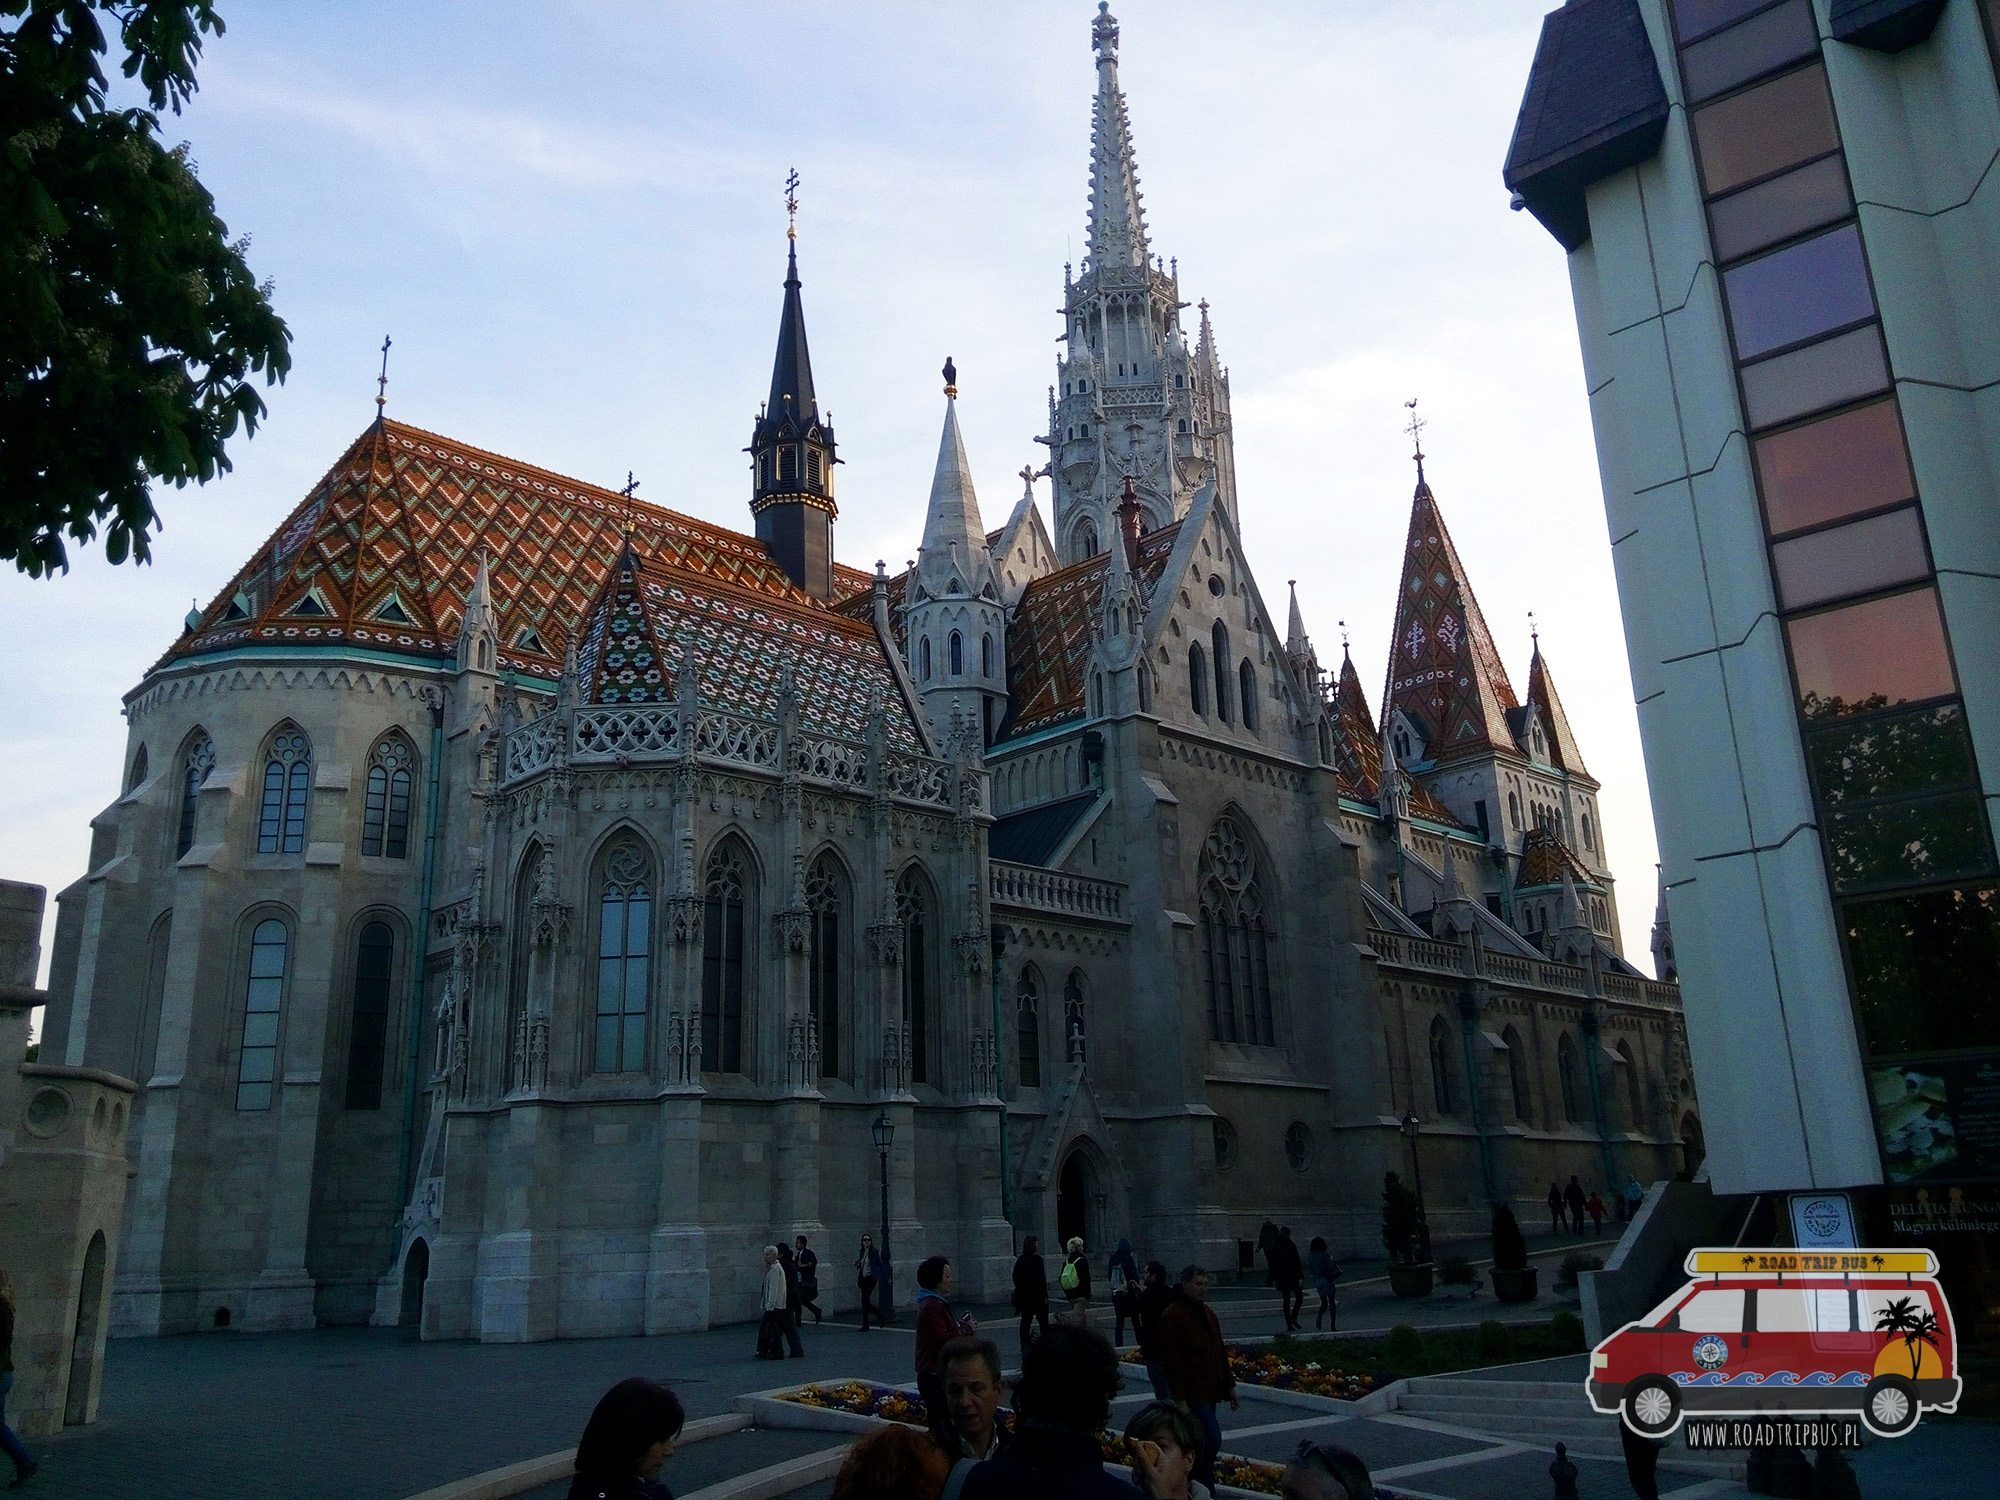 Kościół św. Mateusza